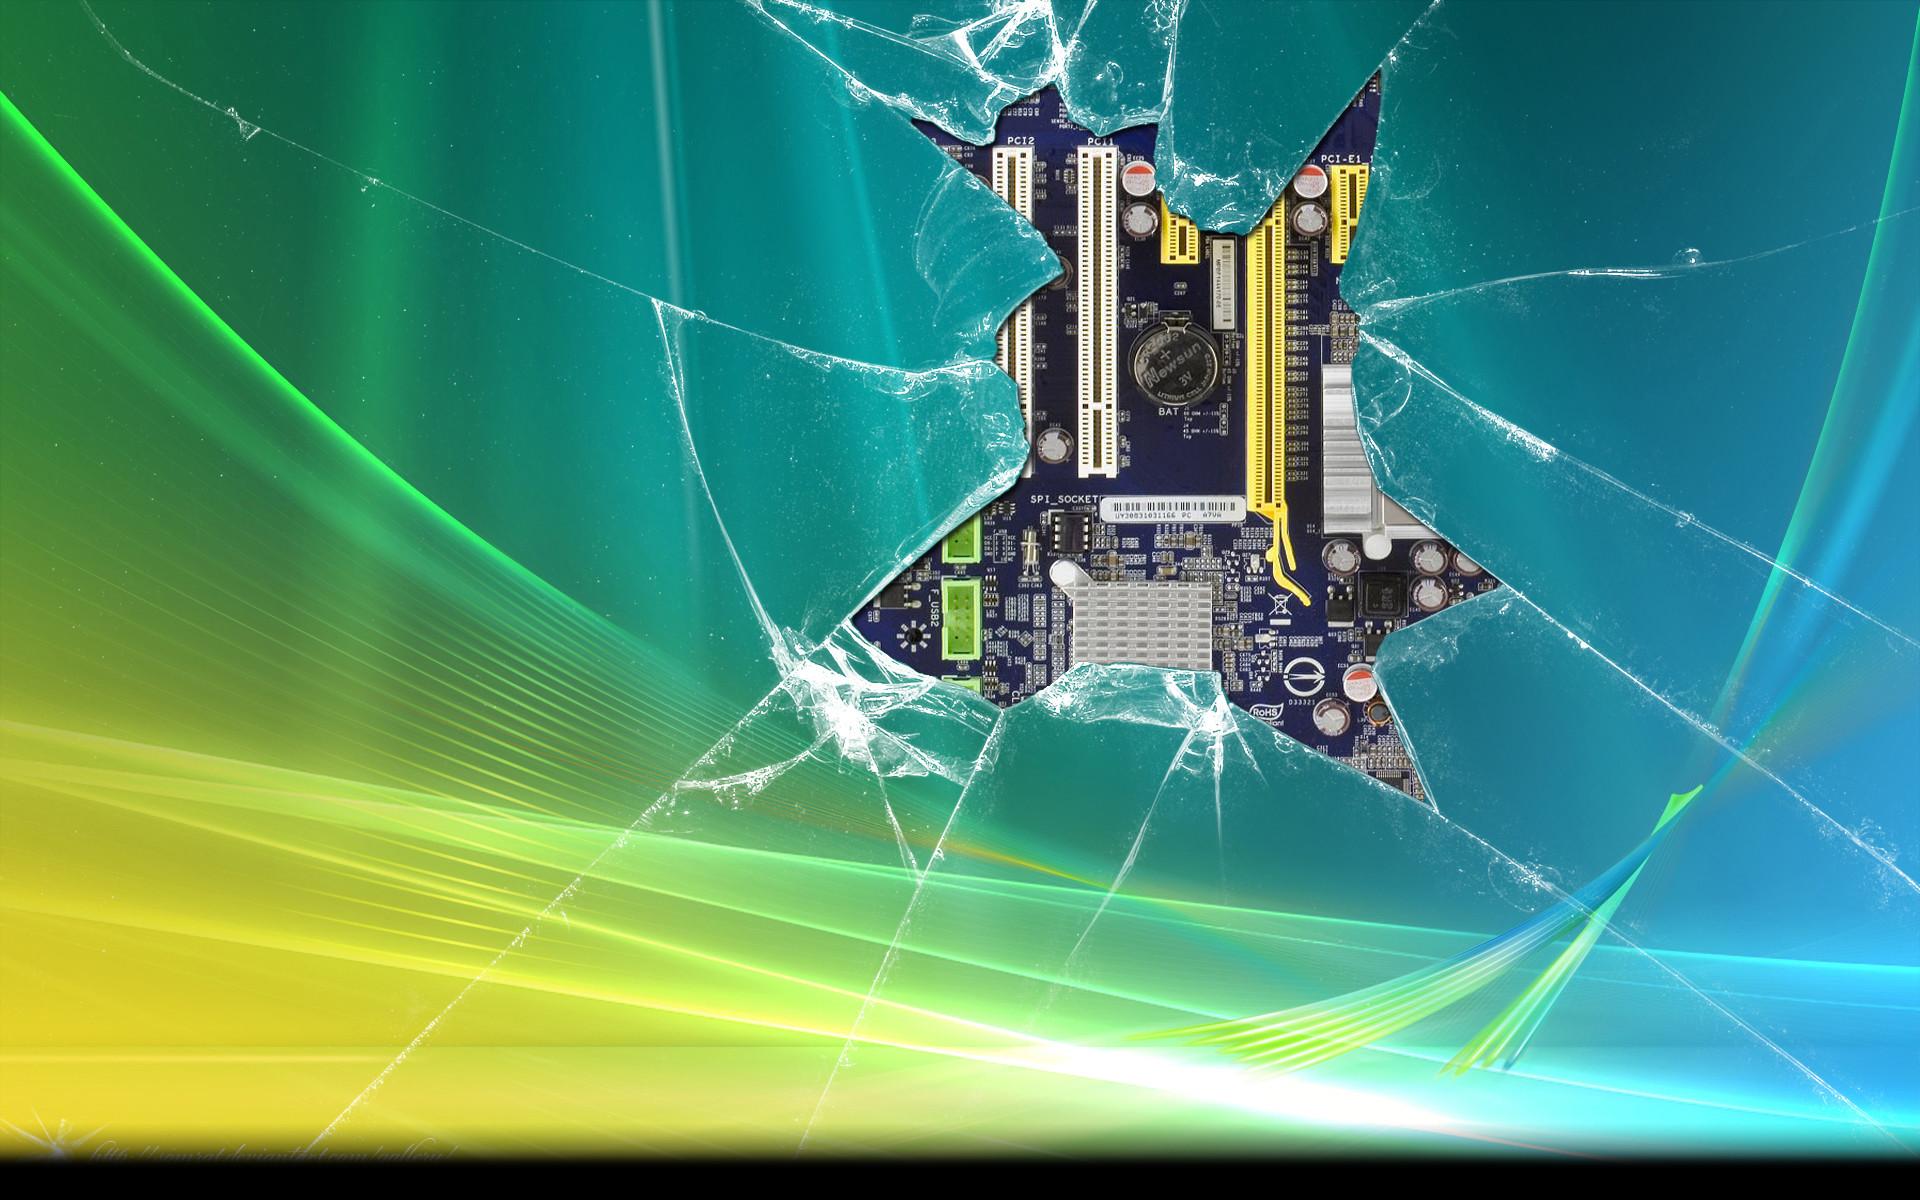 Res: 1920x1200, Broken Vista Chip Wallpaper by cderekw Broken Vista Chip Wallpaper by  cderekw